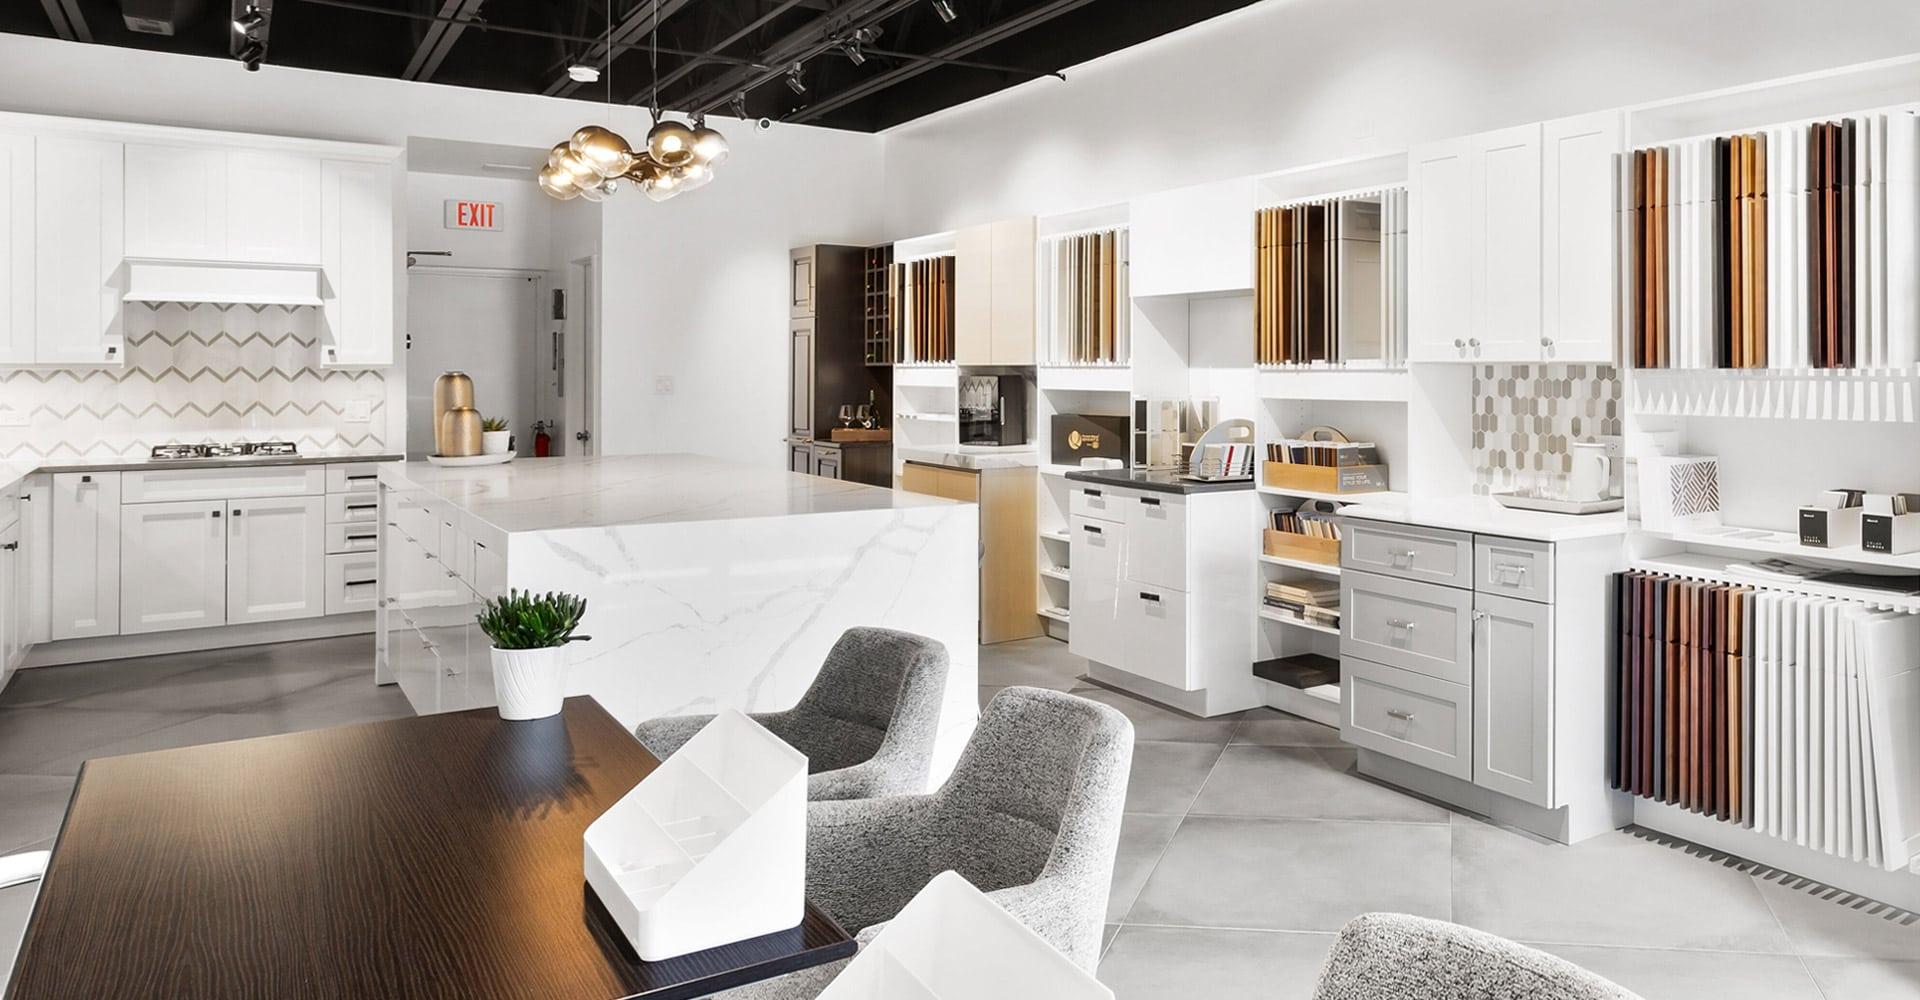 Chicago Kitchen Remodeling Company Chi Renovation